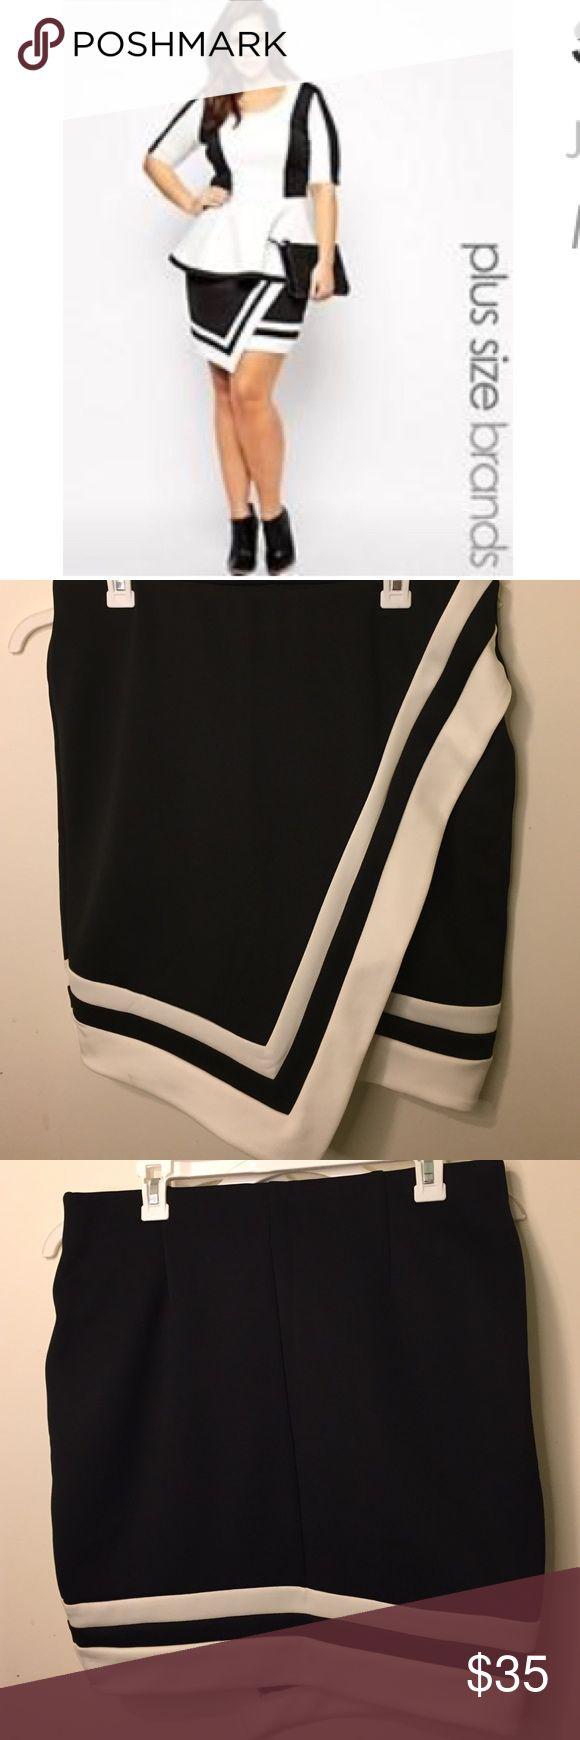 ASOS Curve asymmetric wrap skirt Junarose asymmetric wrap skirt purchased from Asos curve. size US 14, never worn but no tags. Scuba like material. ASOS Curve Skirts Asymmetrical